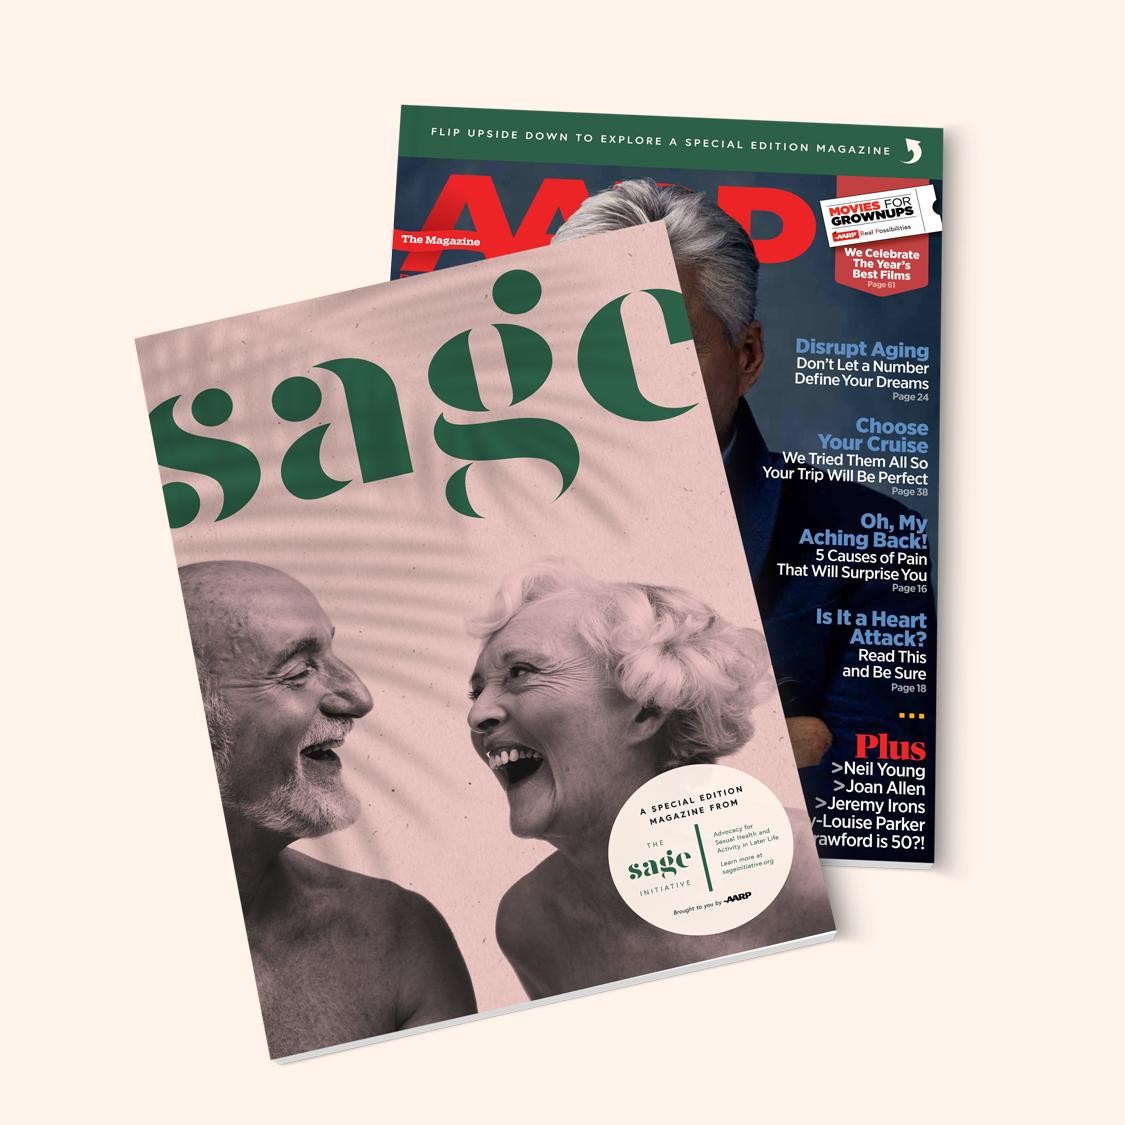 AARP Magazine x Sage